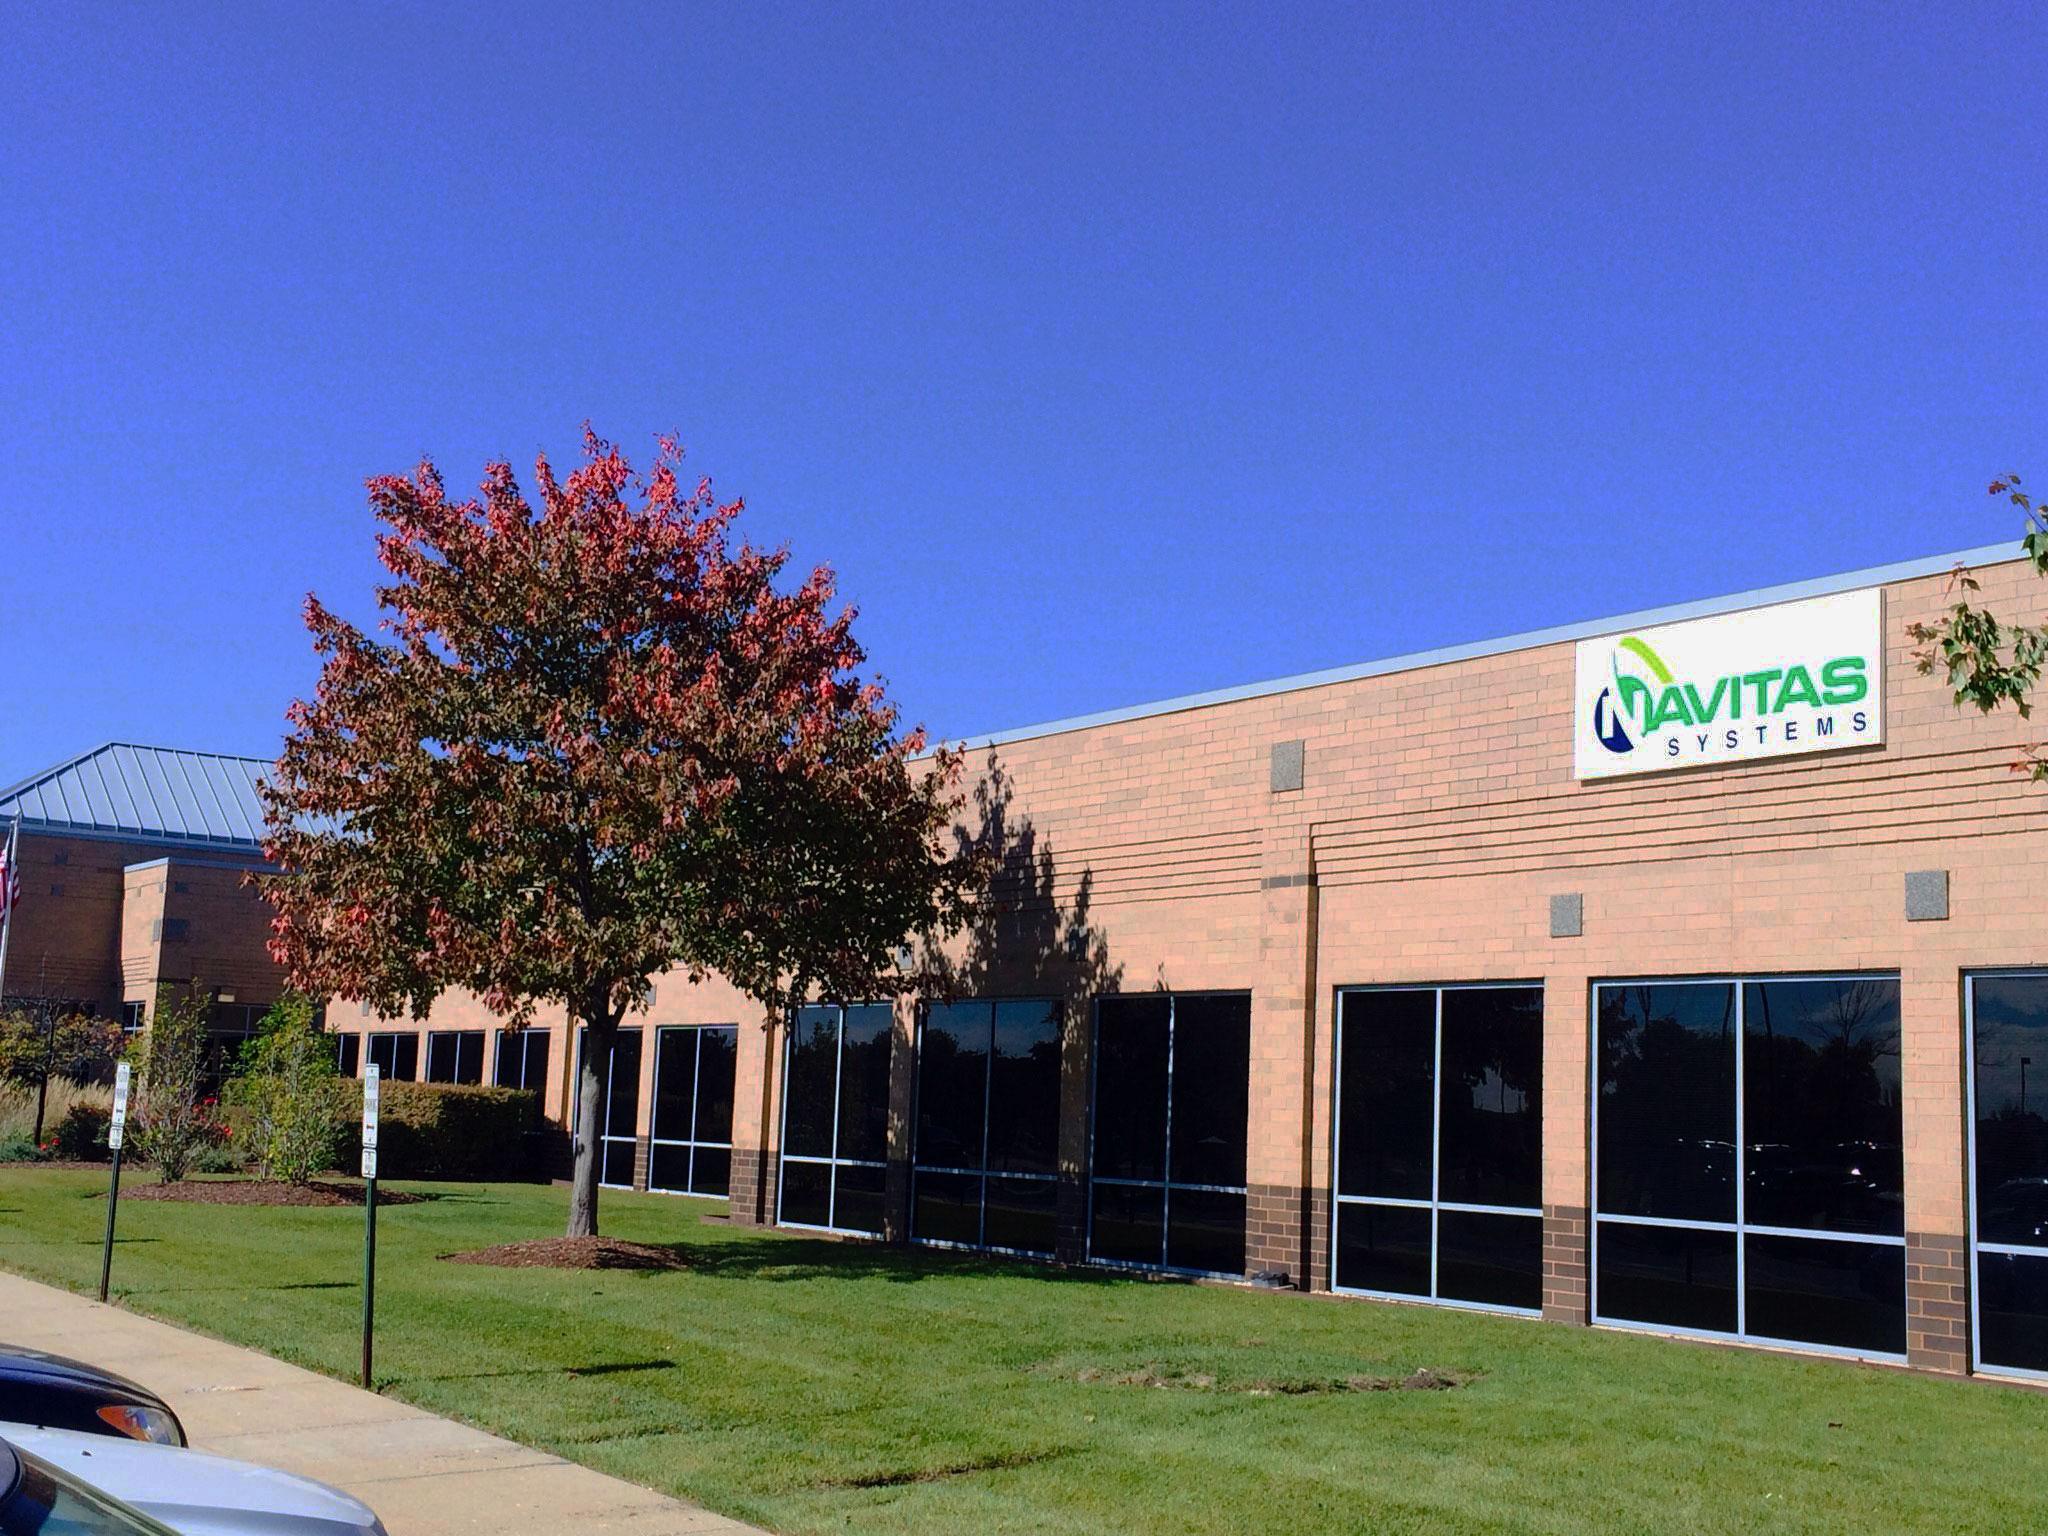 Navitas-Systems-Headquarters-Building-Woodridge-Illinois